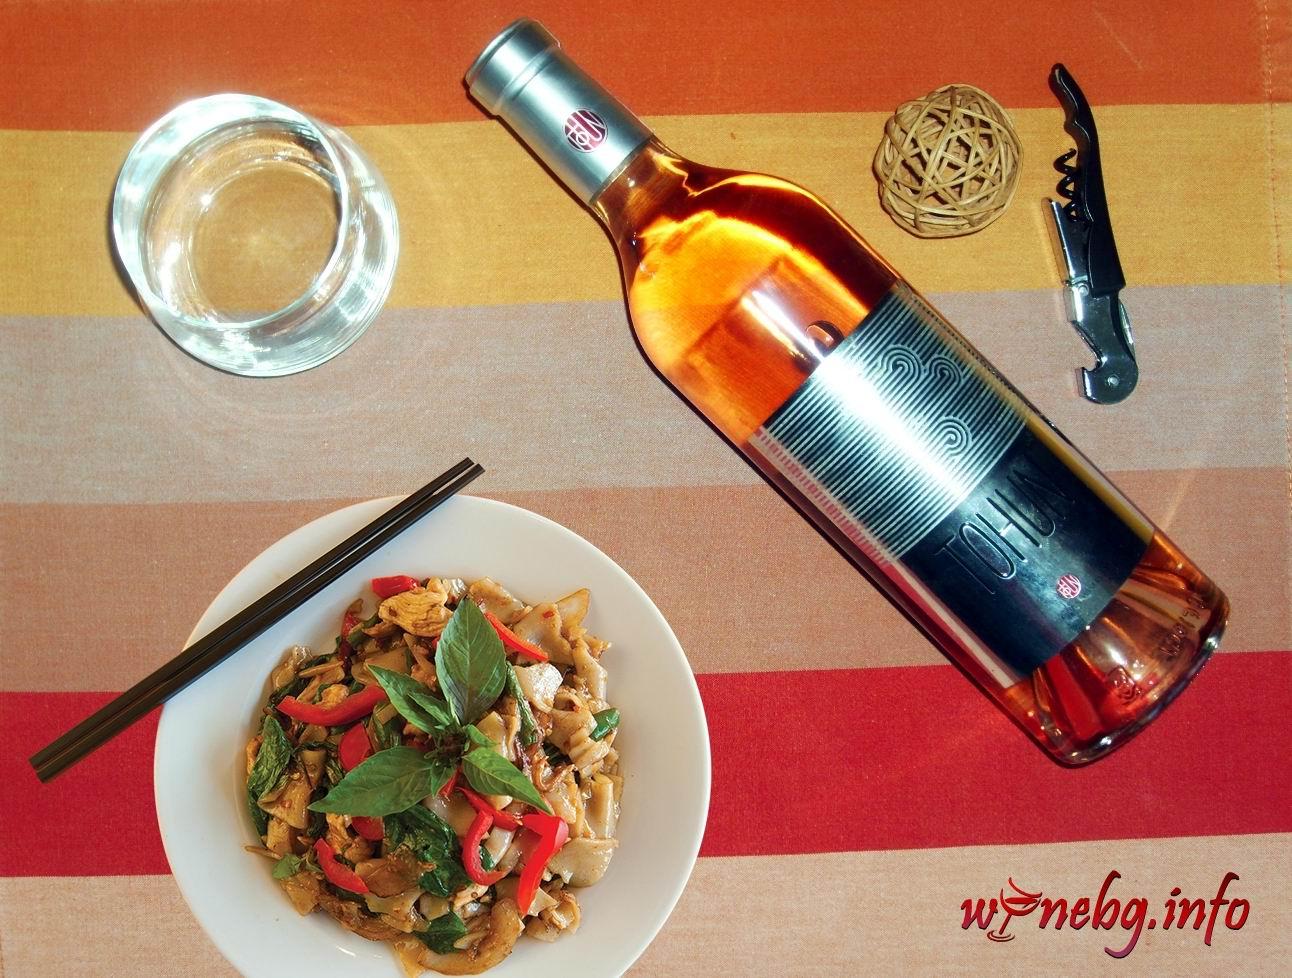 Rose – Cabernet Sauvignon 2015 – TOHUN Winery